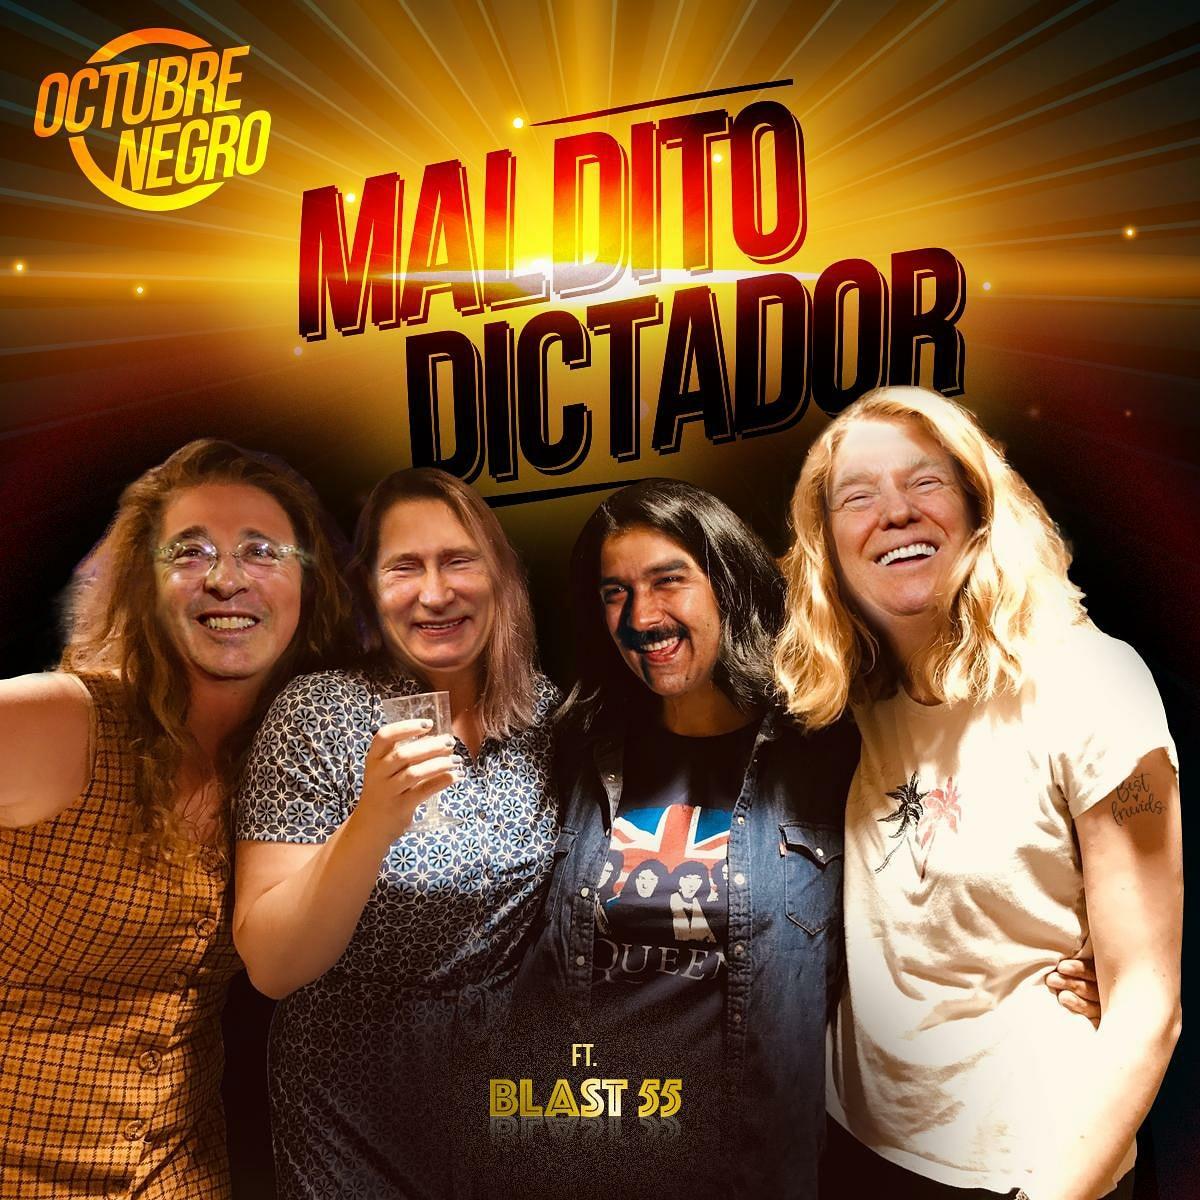 Octubre Negro - Maldito Dictador